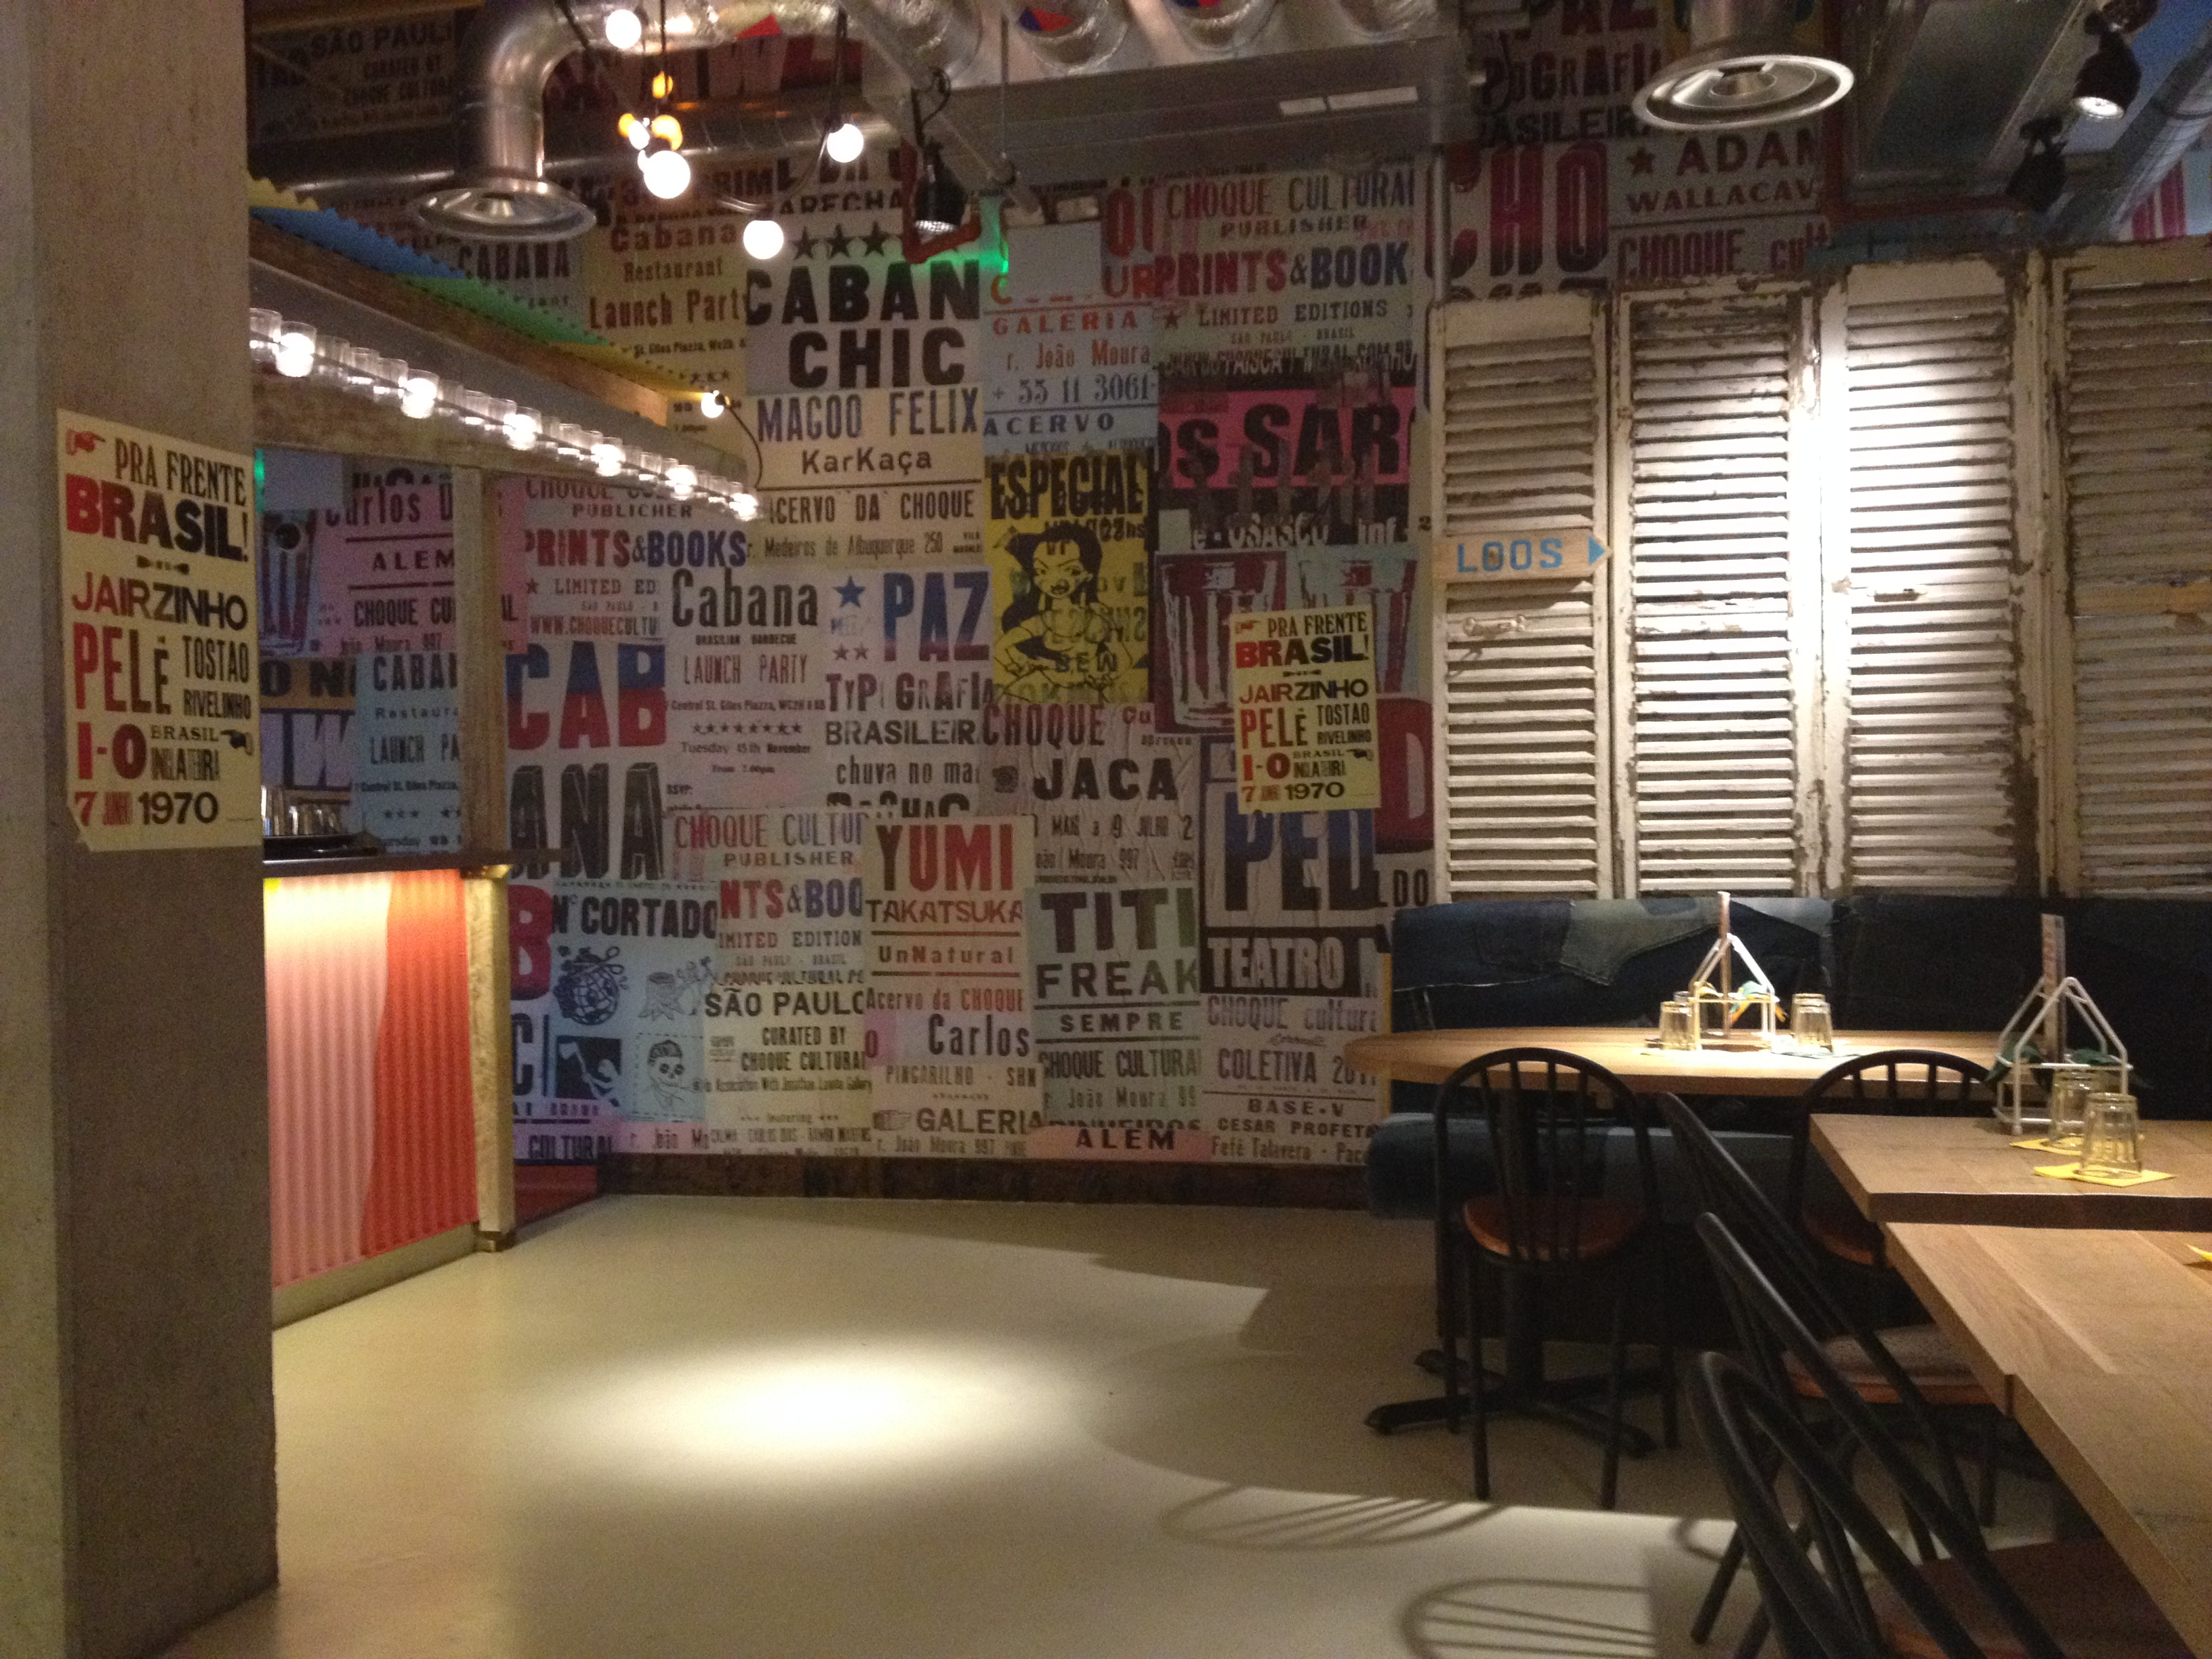 Bbq Restaurant Wall Decor : Cabana brazilian barbecue restaurant review wembley